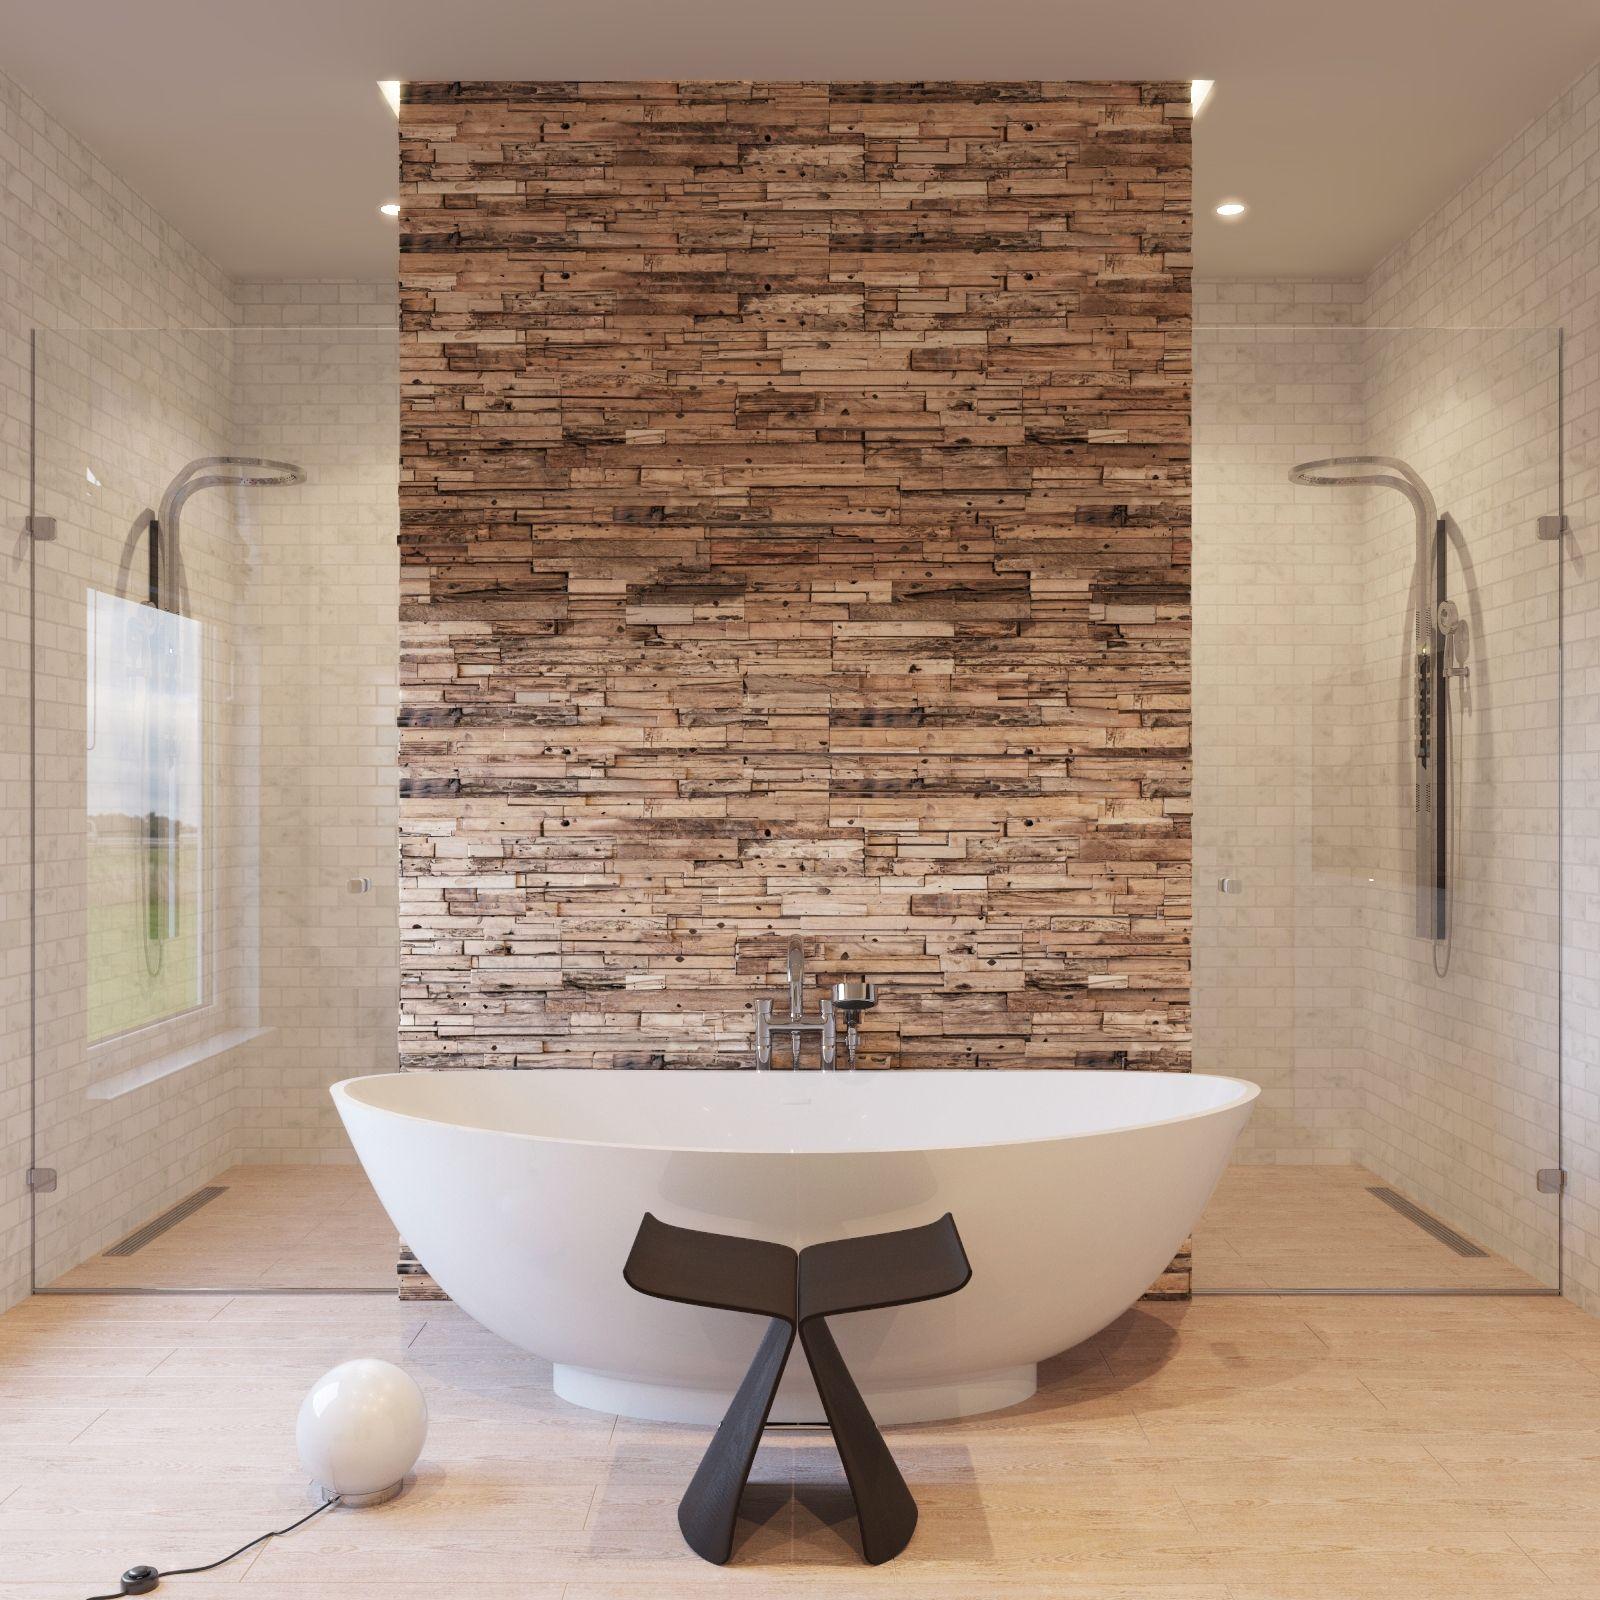 Wood Cladding Bathroom Walls: Reclaimed Teak Wall Panels. Www.teaknco.com